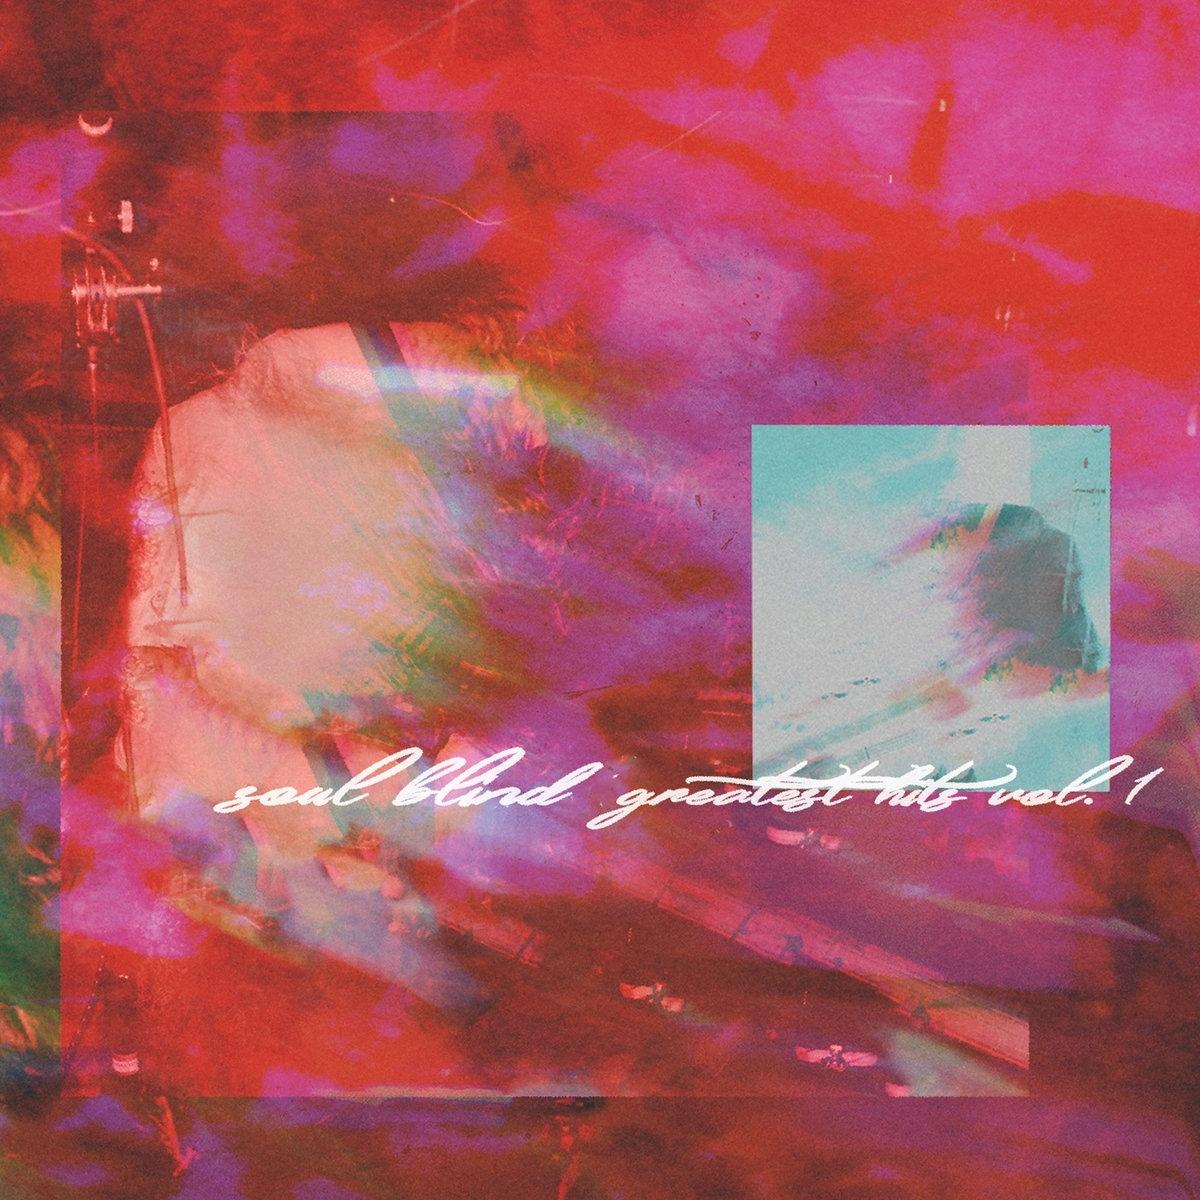 Soul Blind - Greatest Hits Vol. 1 [Compilation]